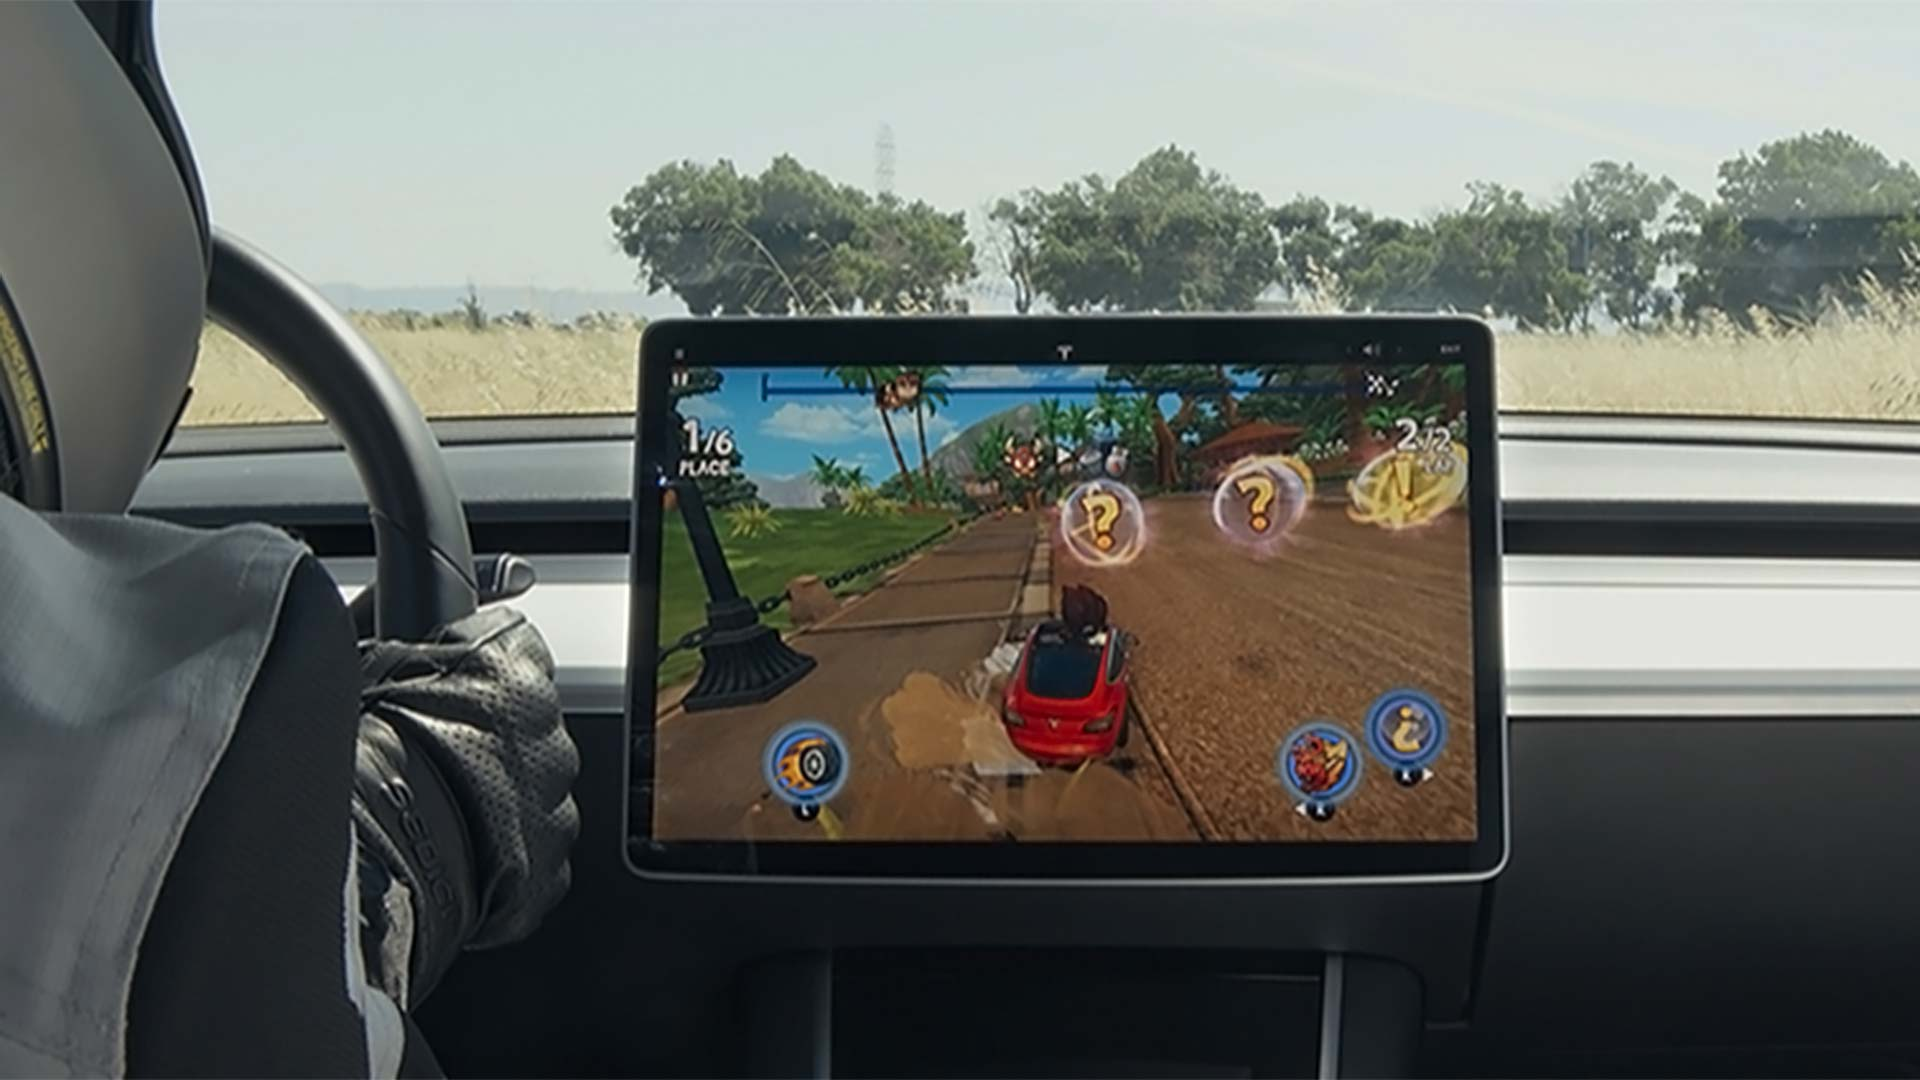 Tesla Arcade Mode